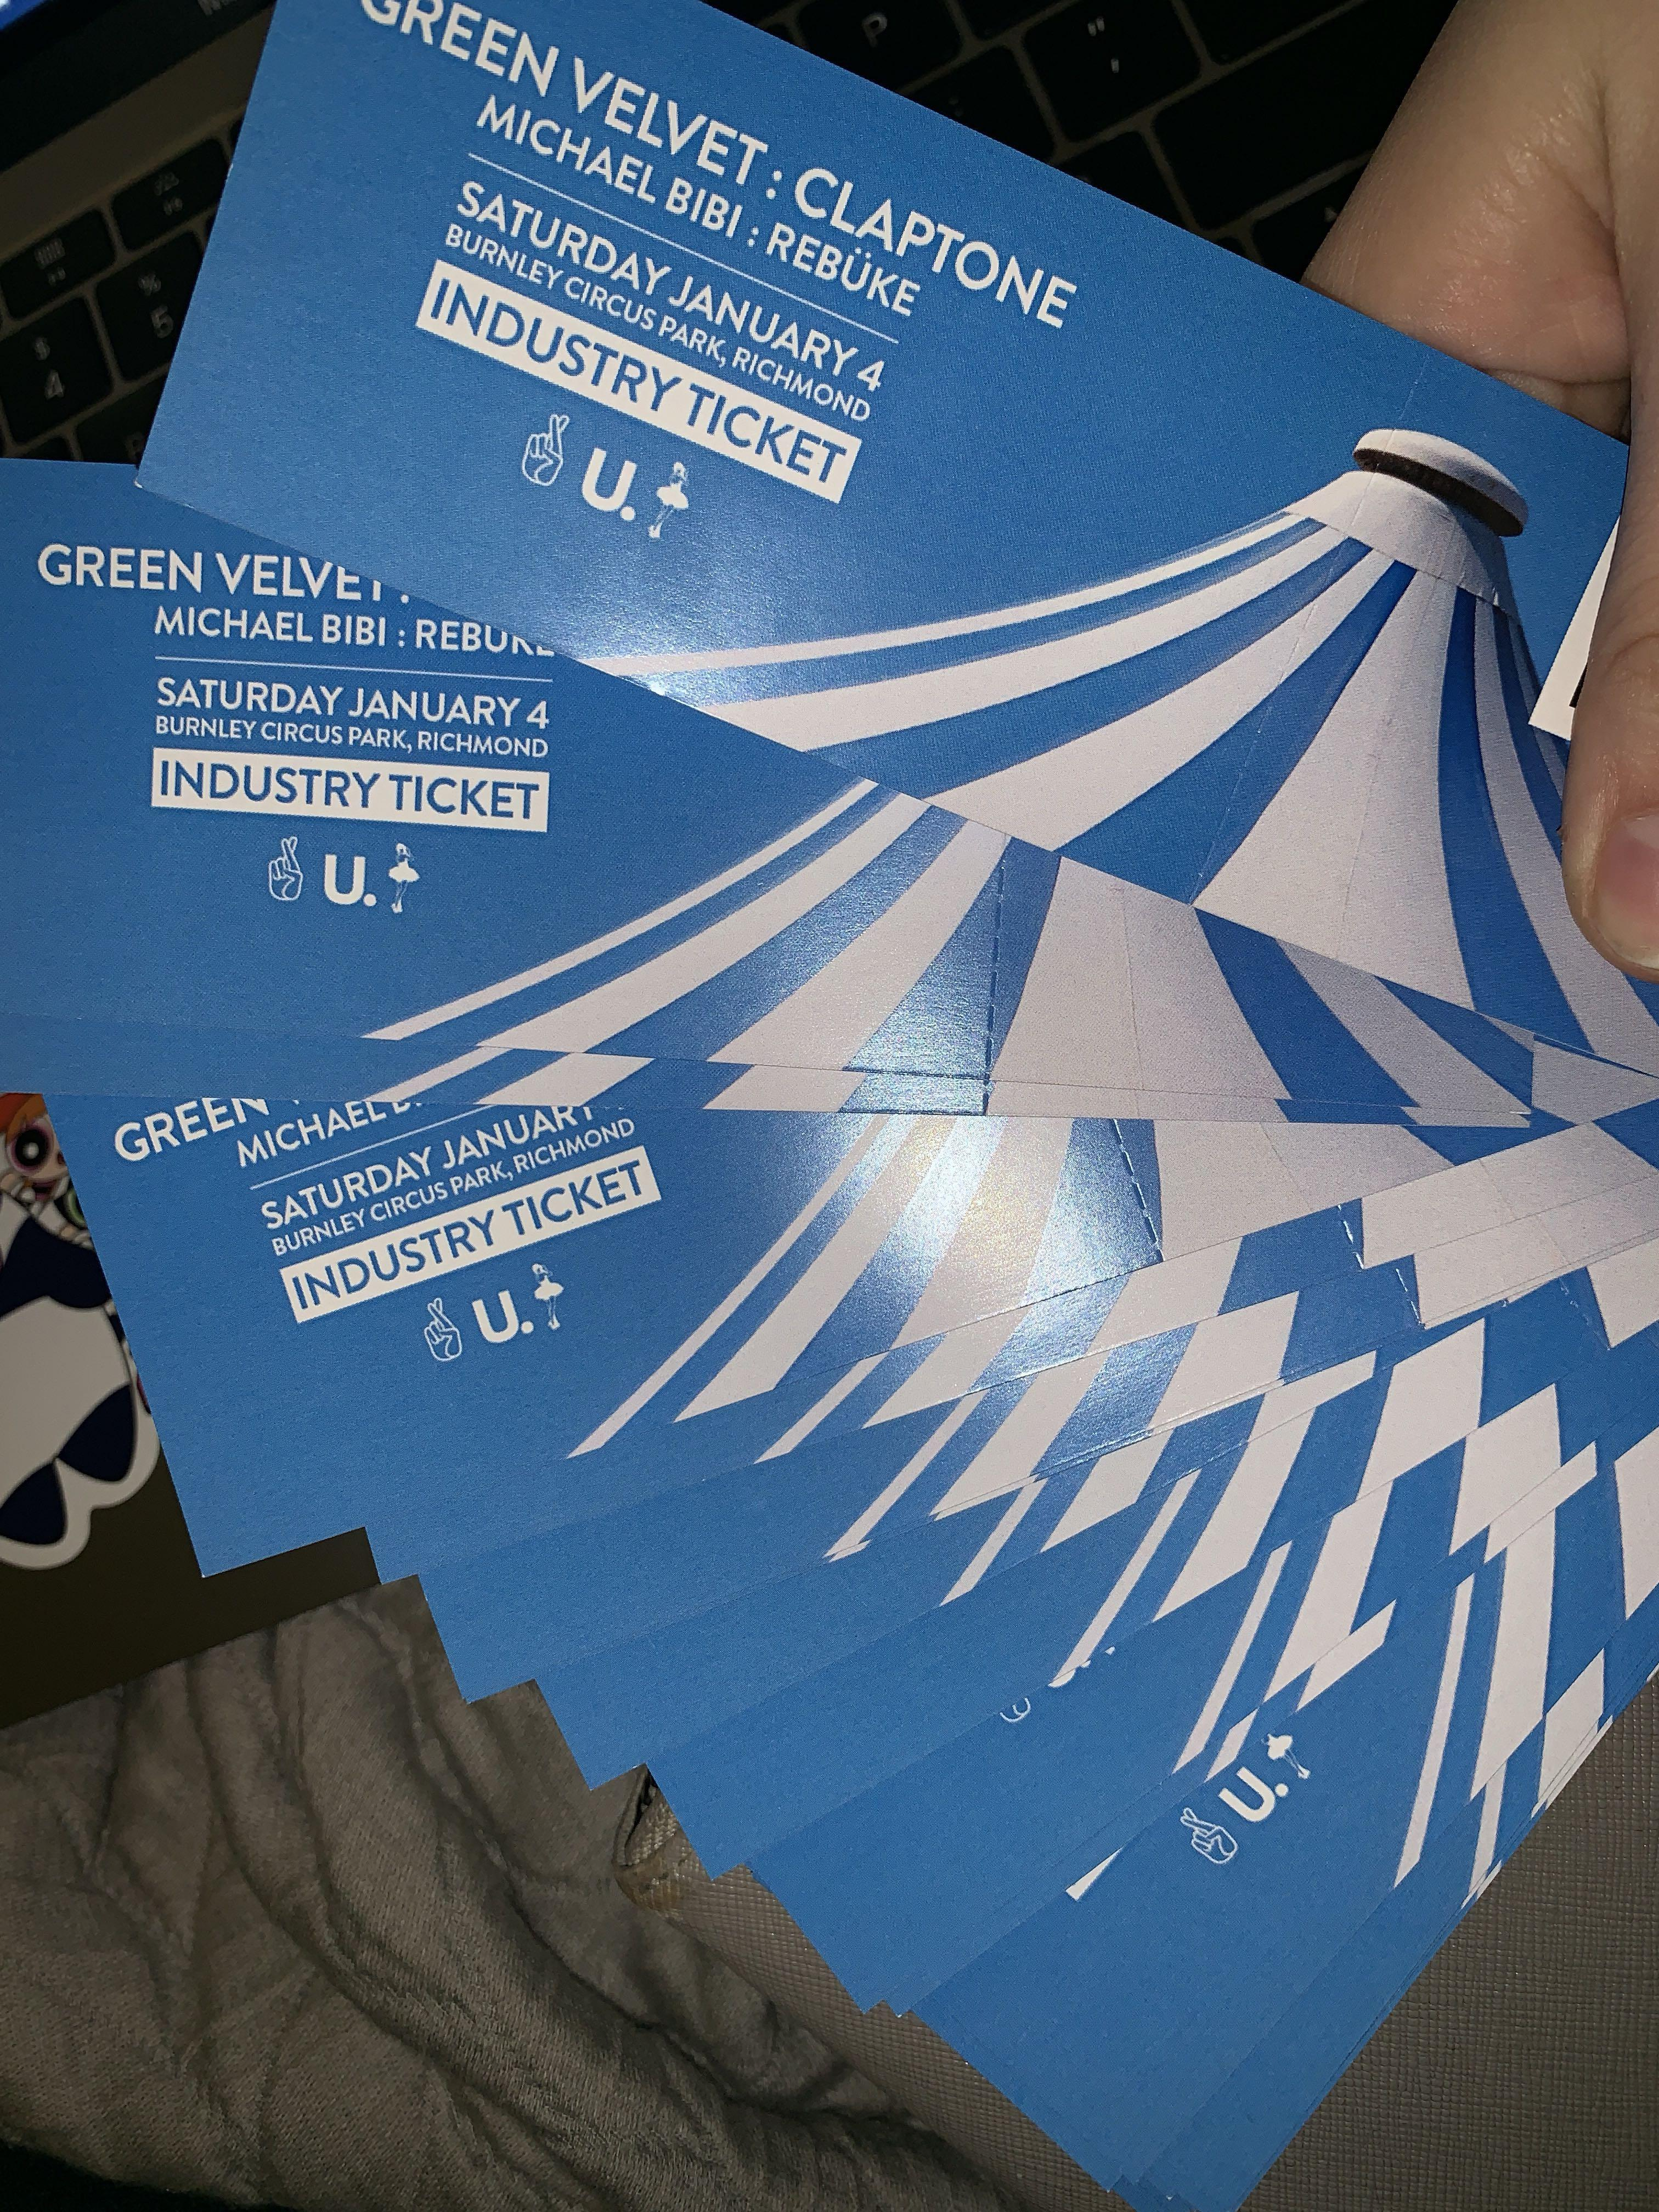 Green Velvet: Claptone: Michael Bibi: Rebuke tickets